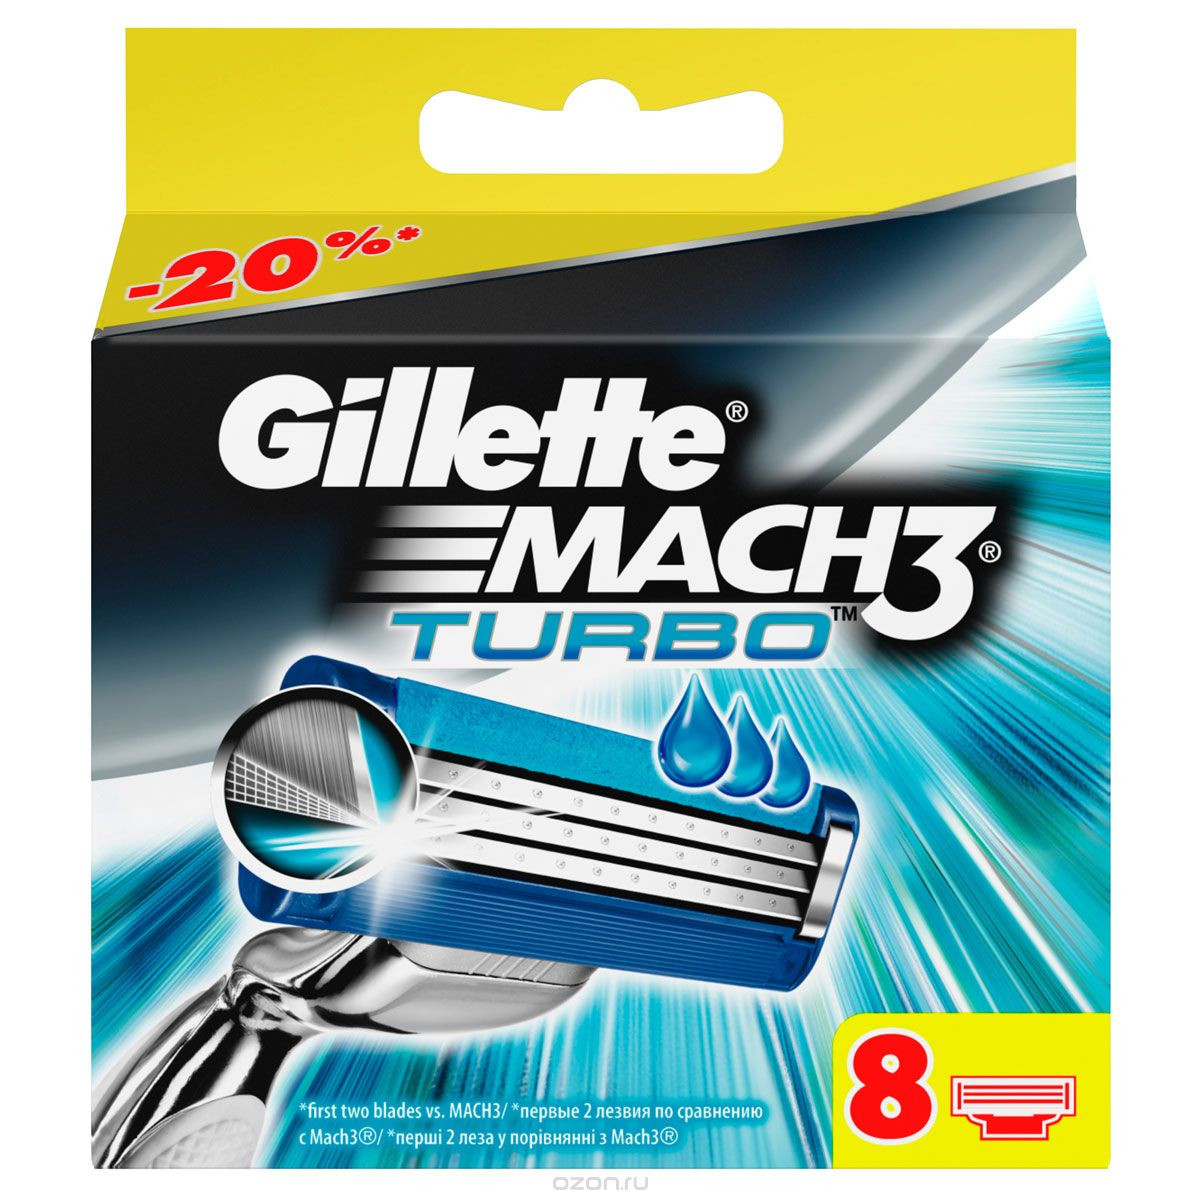 Картриджи Gillette Mach3 Turbo 8's лезвия Китай